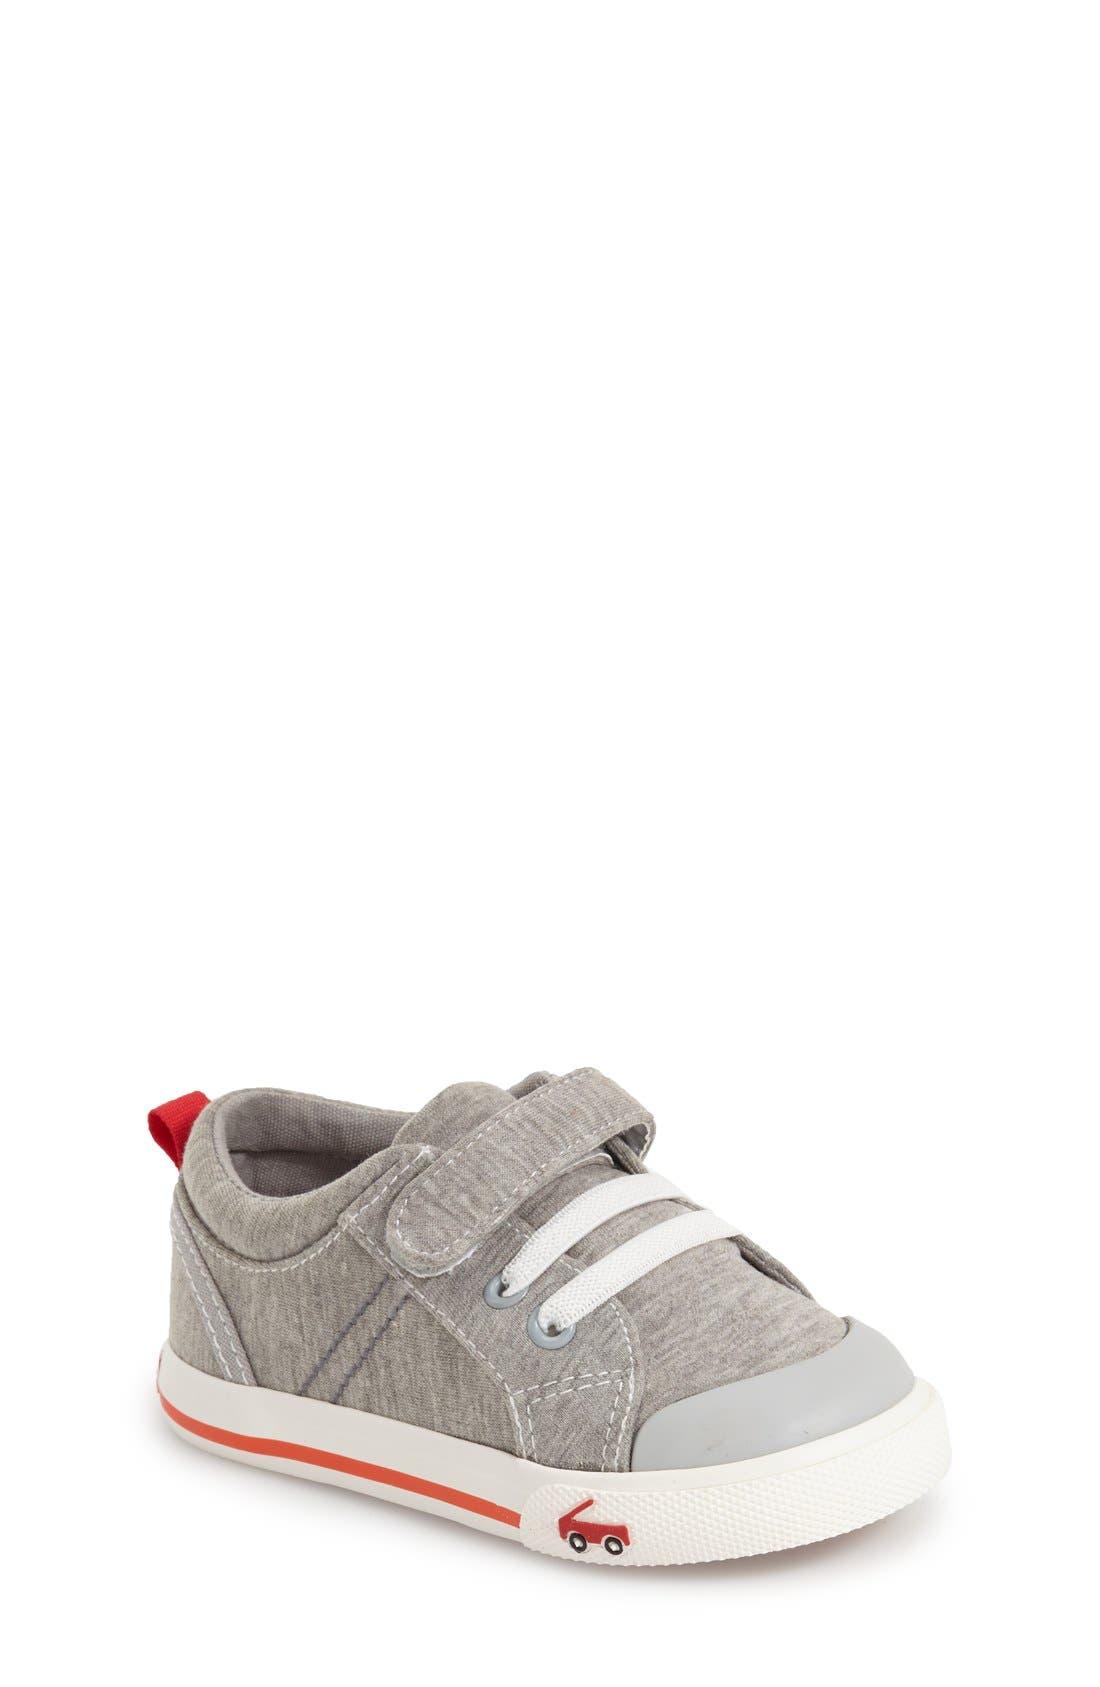 See Kai Run 'Tanner' Sneaker (Baby, Walker & Toddler)